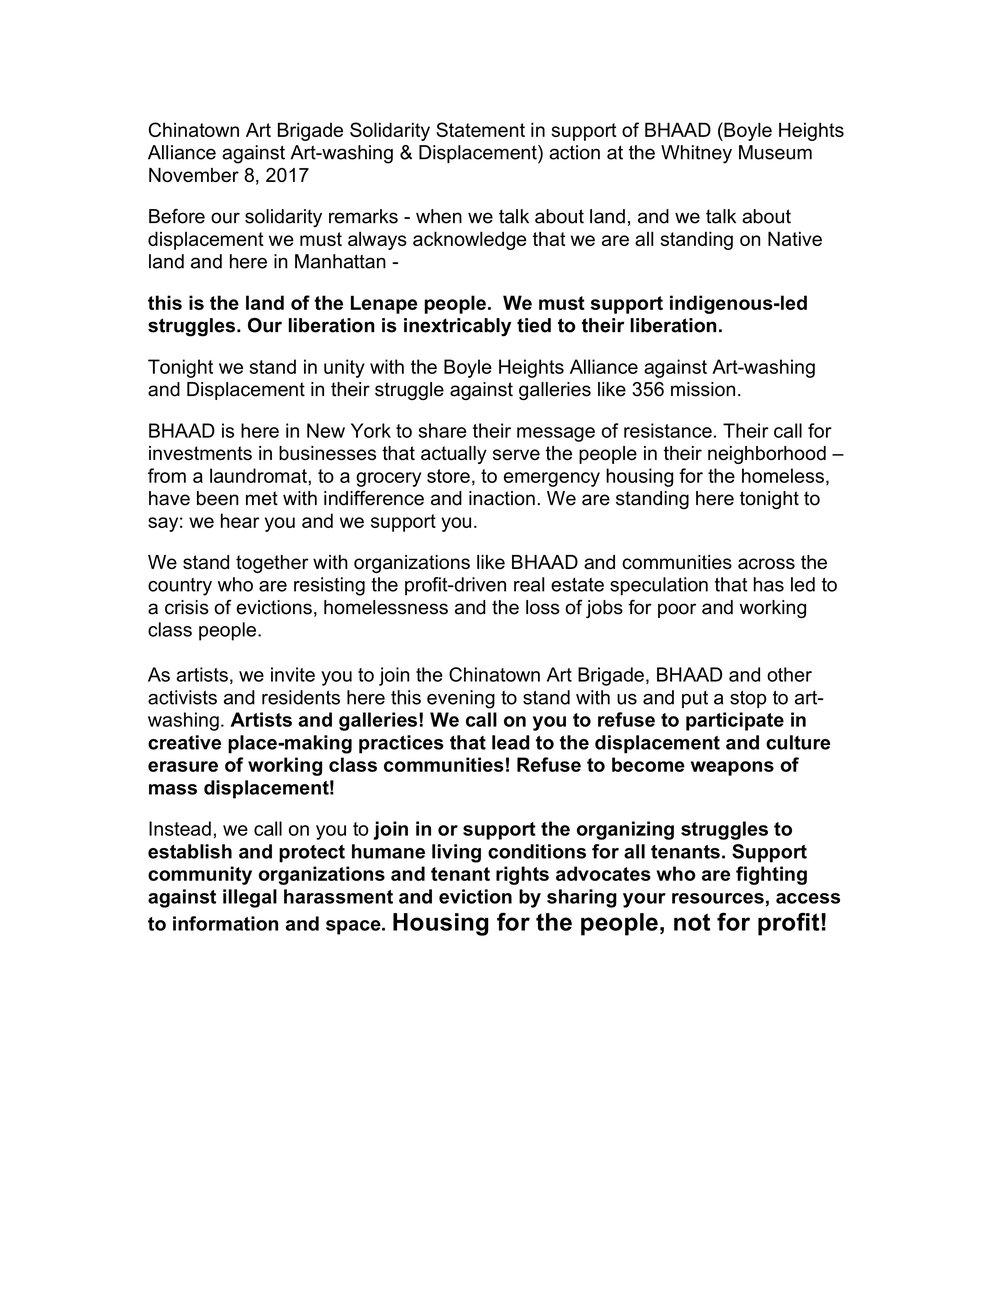 Chinatown Art Brigade Solidarity Statement in support of BHAAD.jpg